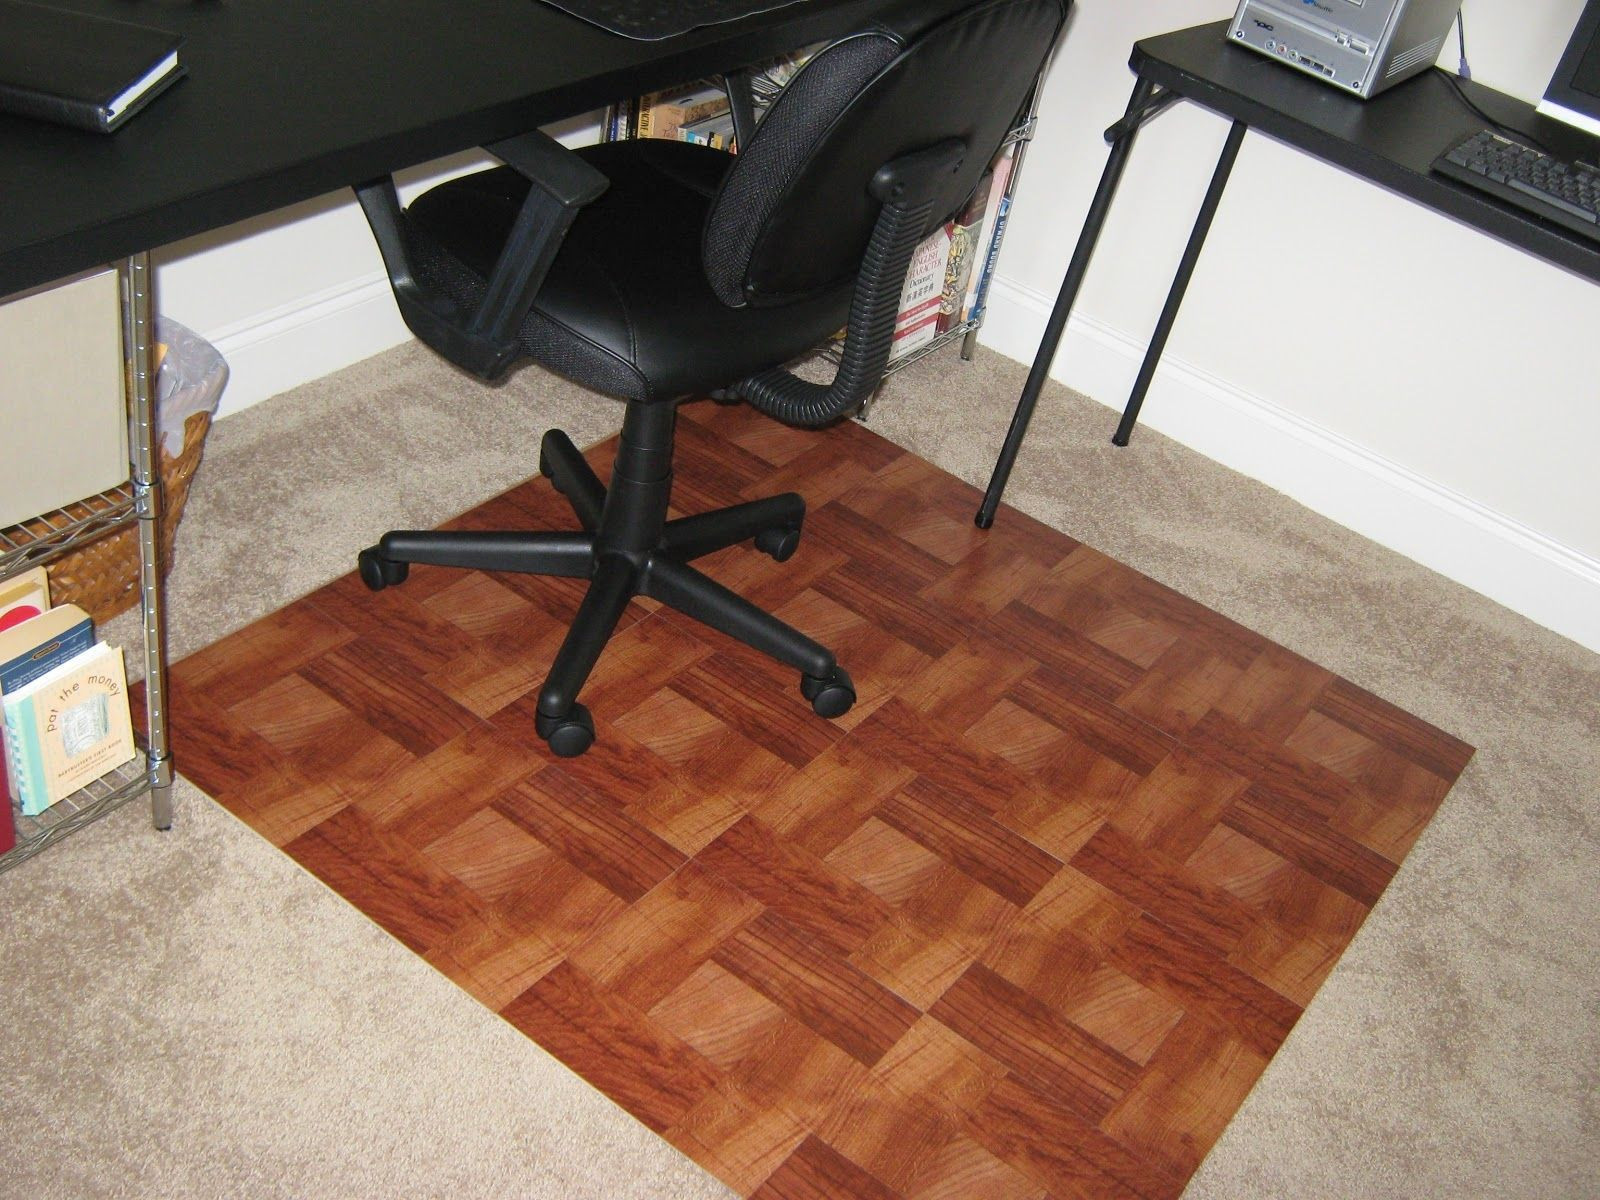 hardwood tile flooring of wood chair mat new adorable chair mat fresh houzz lighting fixtures for wood chair mat new best fice chair mats for hardwood floors of wood chair mat new